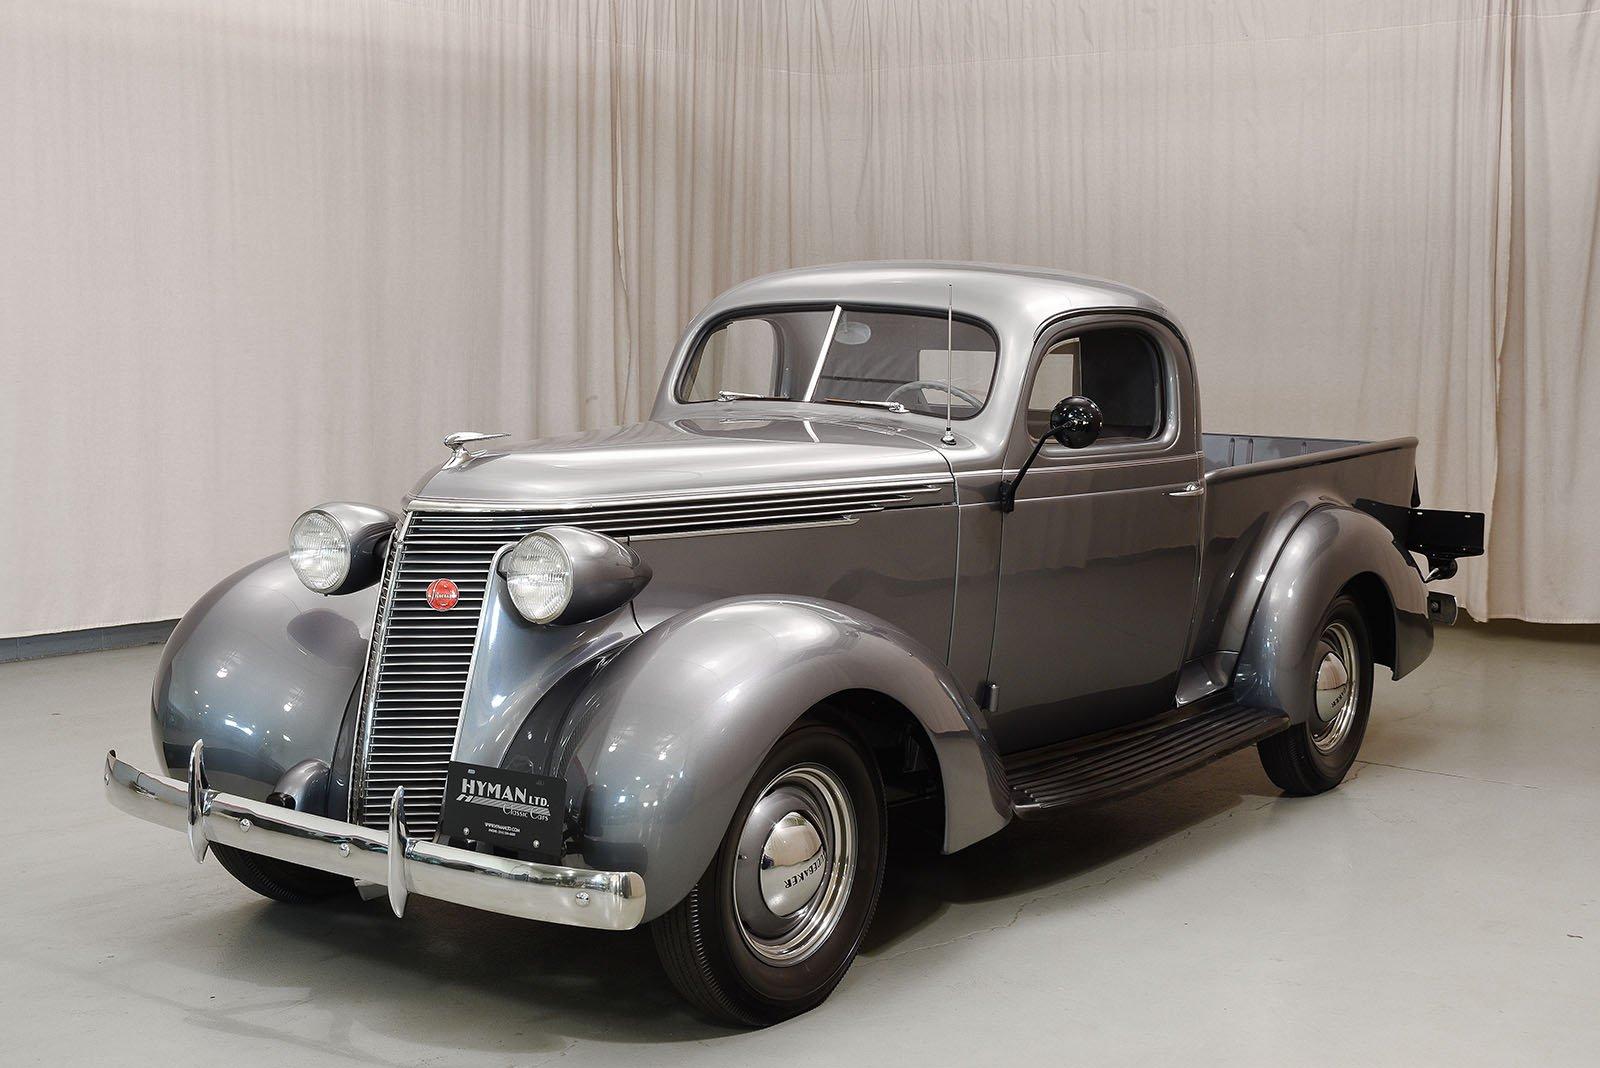 1937 Studebaker Coupe Express Truck | Hyman Ltd. Classic Cars